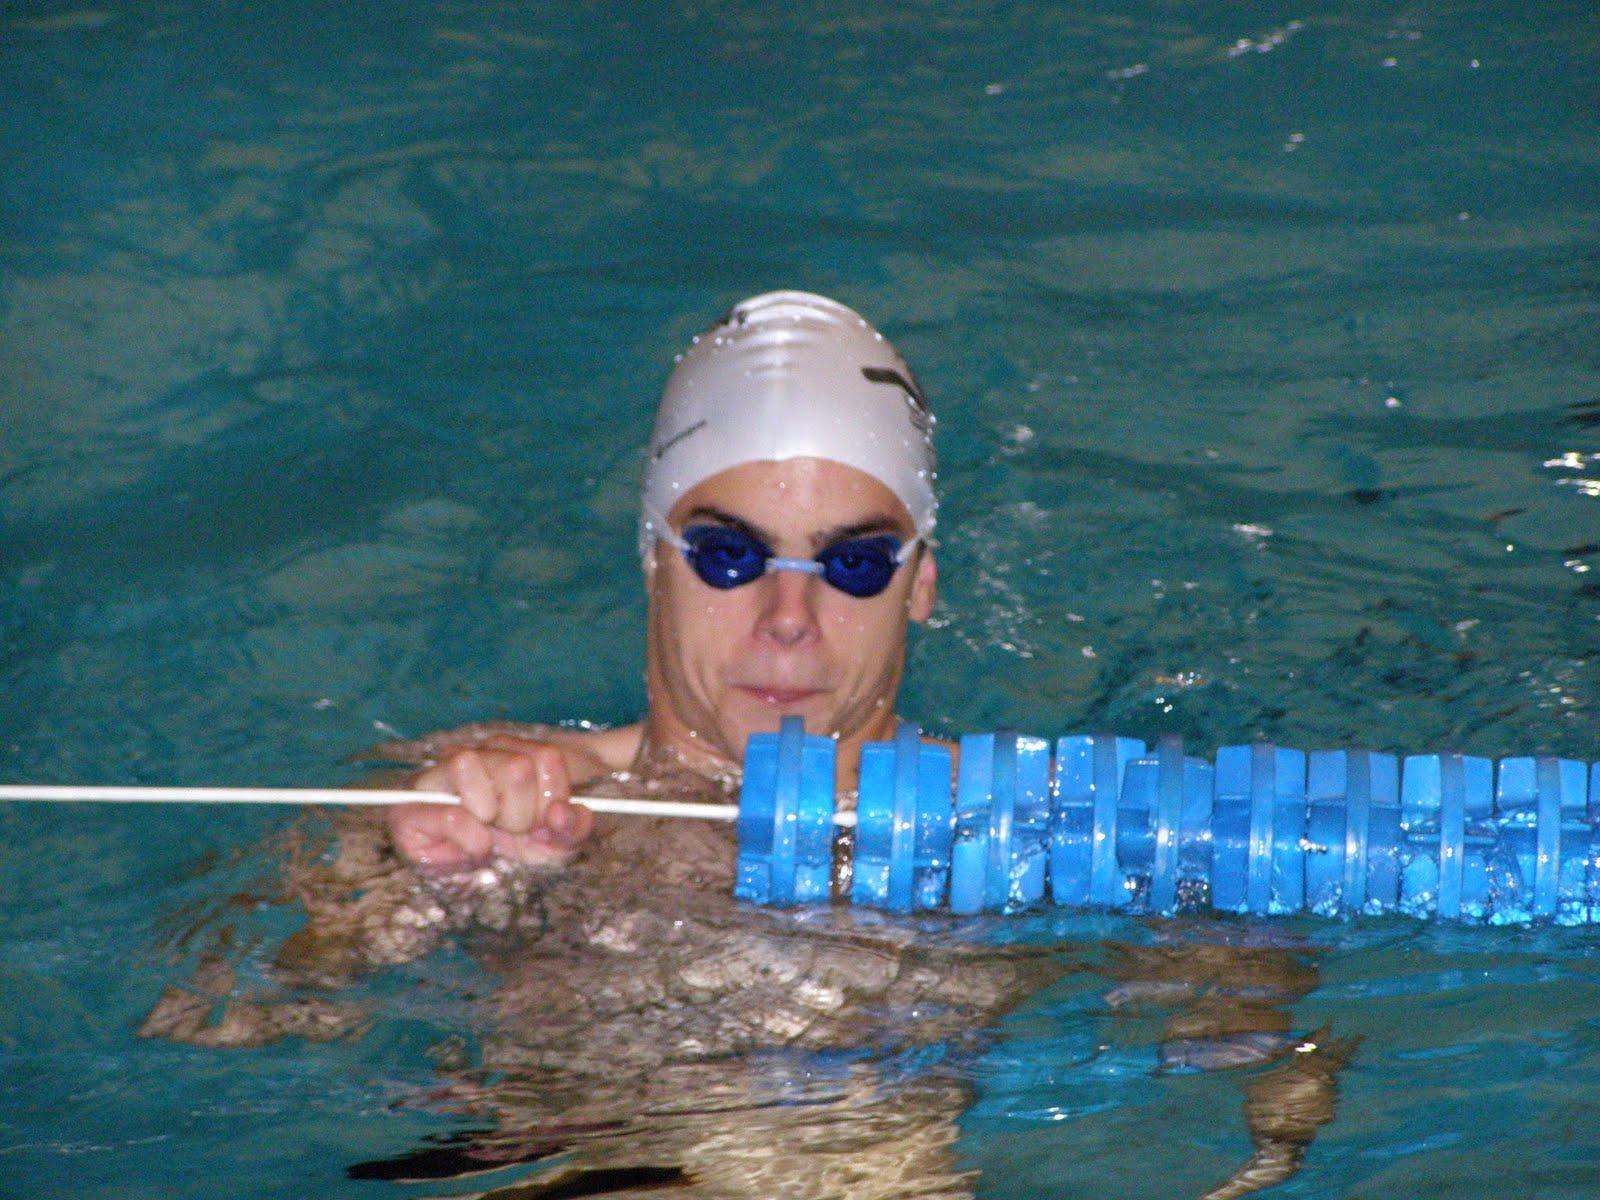 U s s p natation n3 tours du 27 au 29 mai 2011 for Piscine gilbert bozon